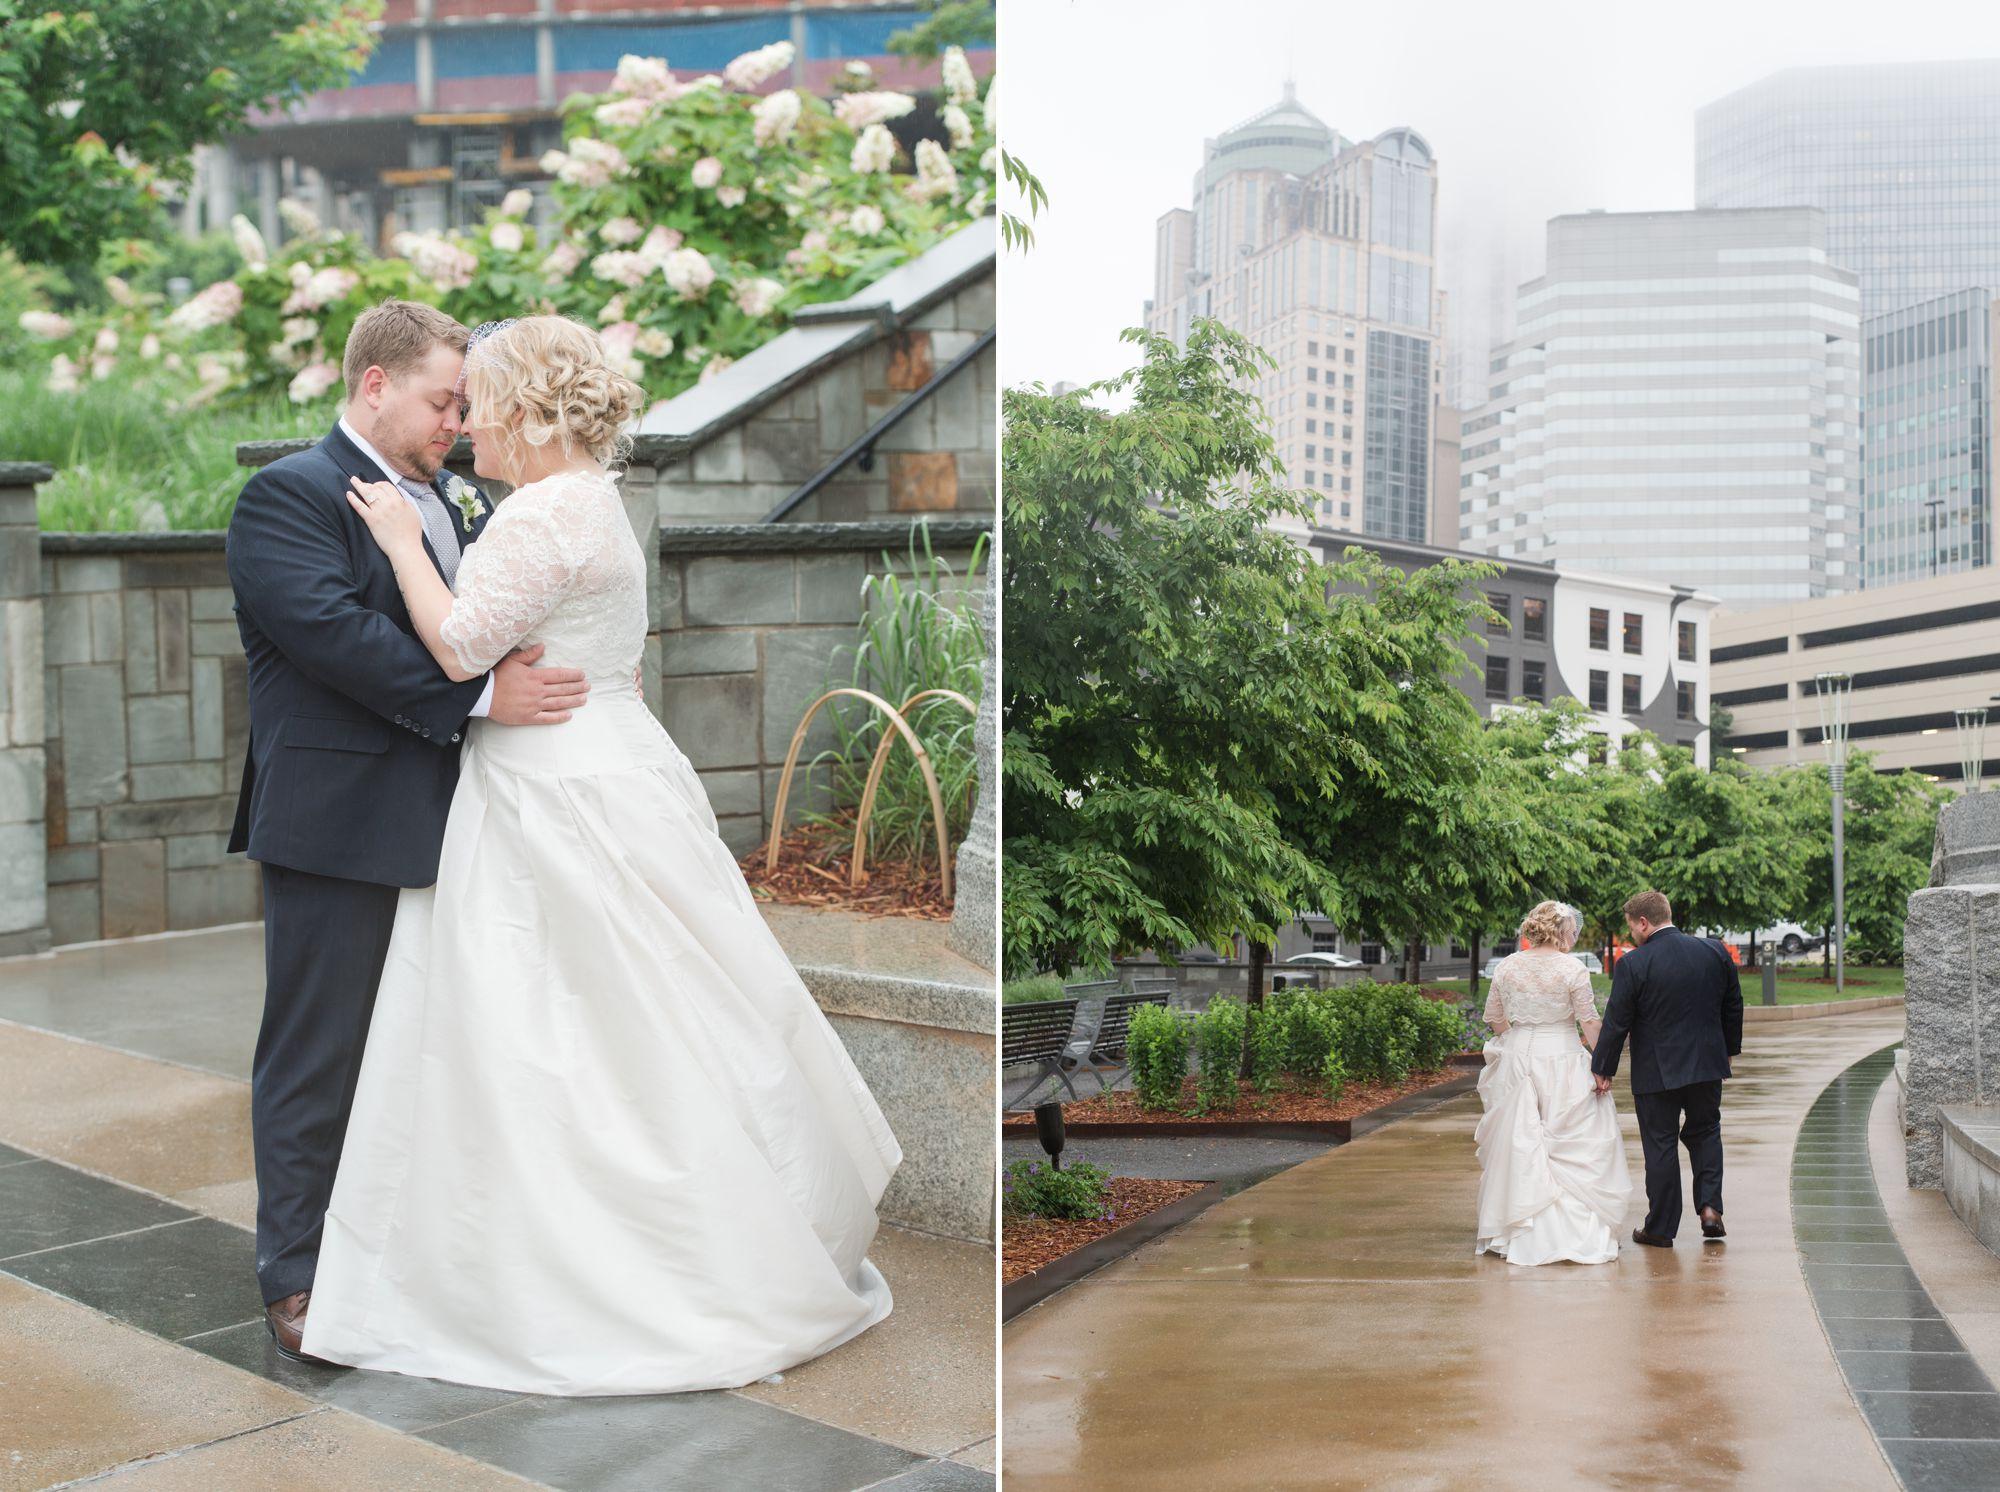 uptown-charlotte-warhouse-wedding 35